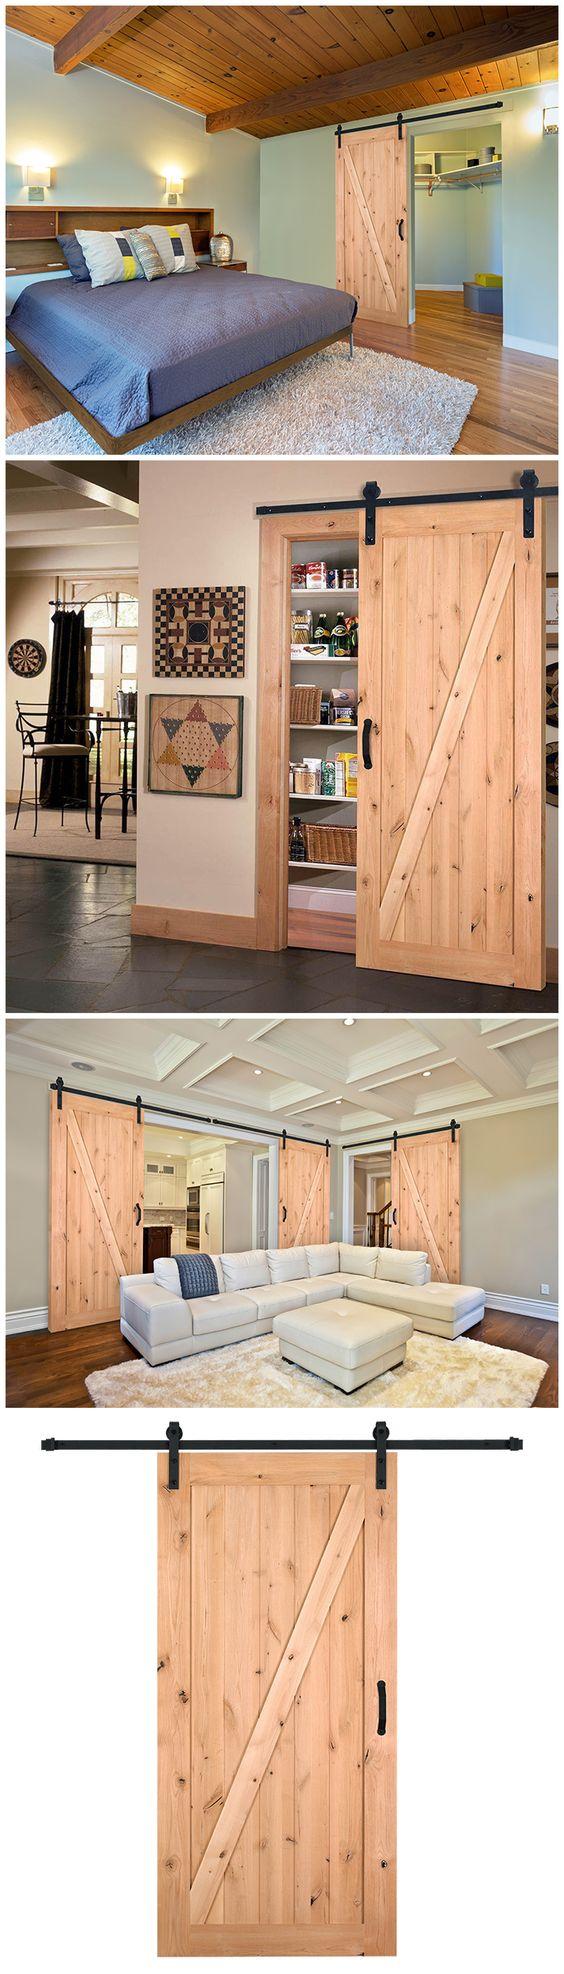 Doors lakes italia affini semi frame less pivot door 1000 x 1910mm - 15 Dreamy Sliding Barn Door Designs Sliding Door Doors And Traditional